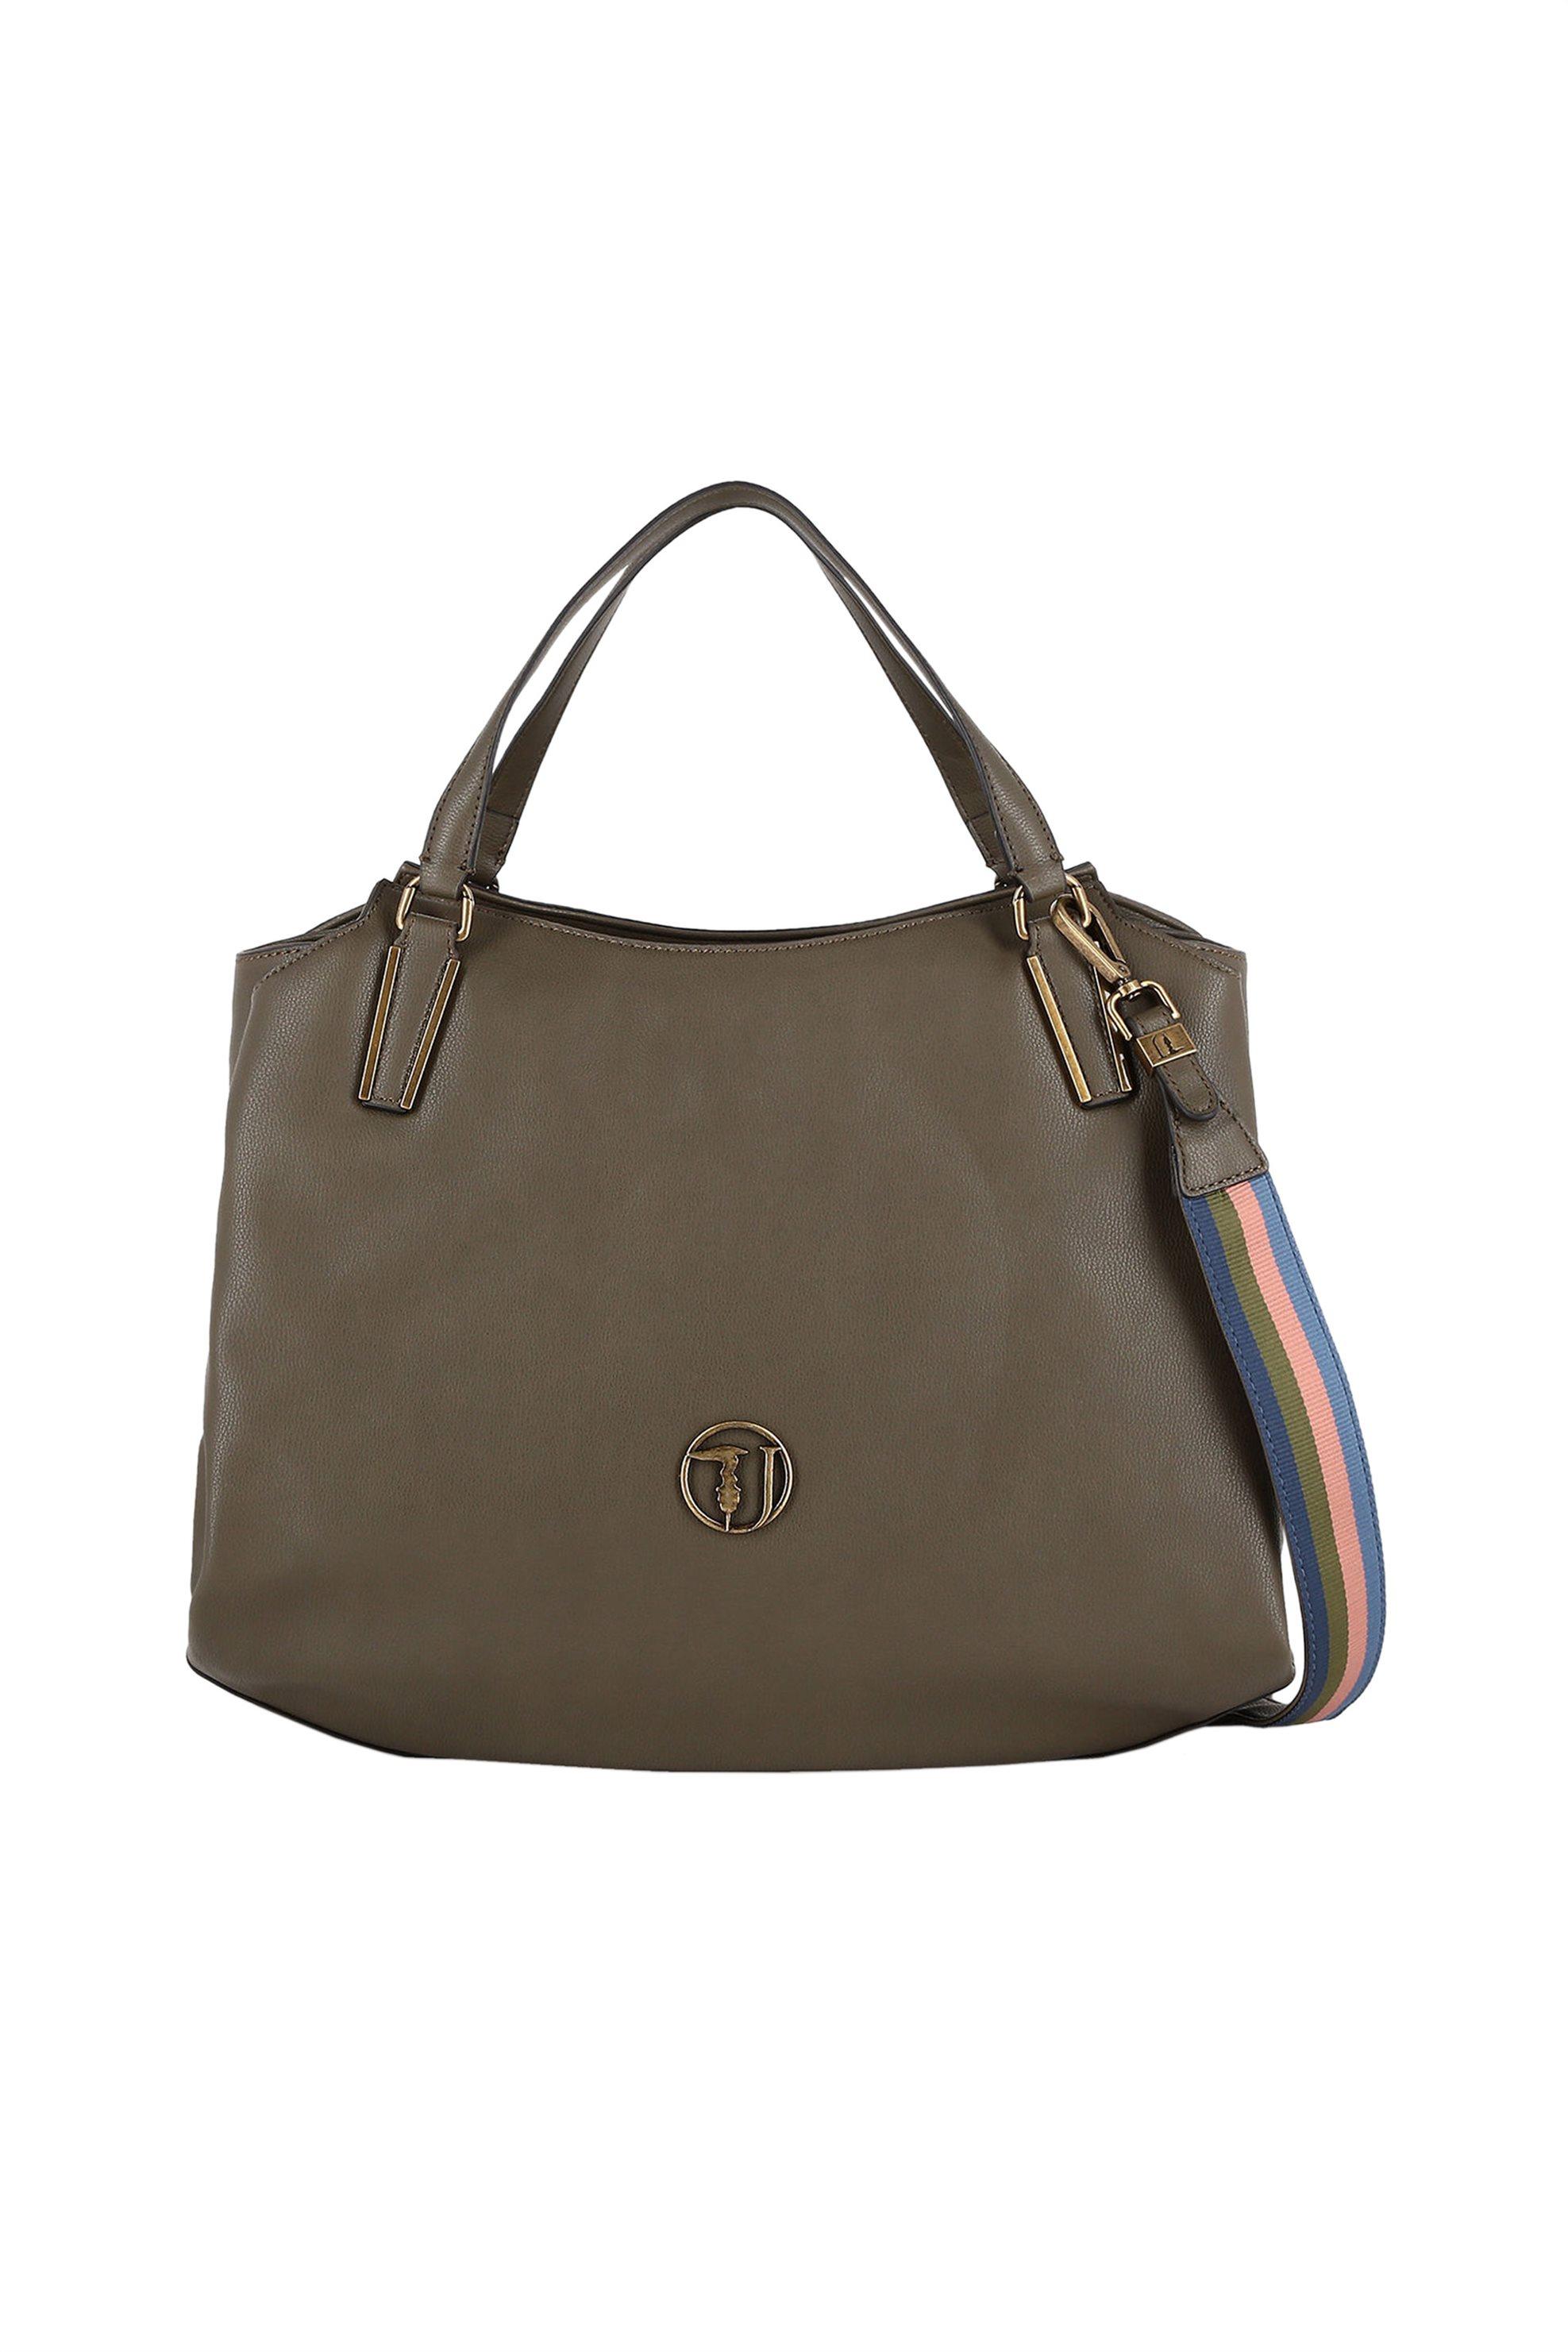 Trussardi Jeans γυναικεία τσάντα Rabarbaro Tote - 75B00551-9Y099999 - Χακί γυναικα   τσαντεσ   τσάντες χειρός